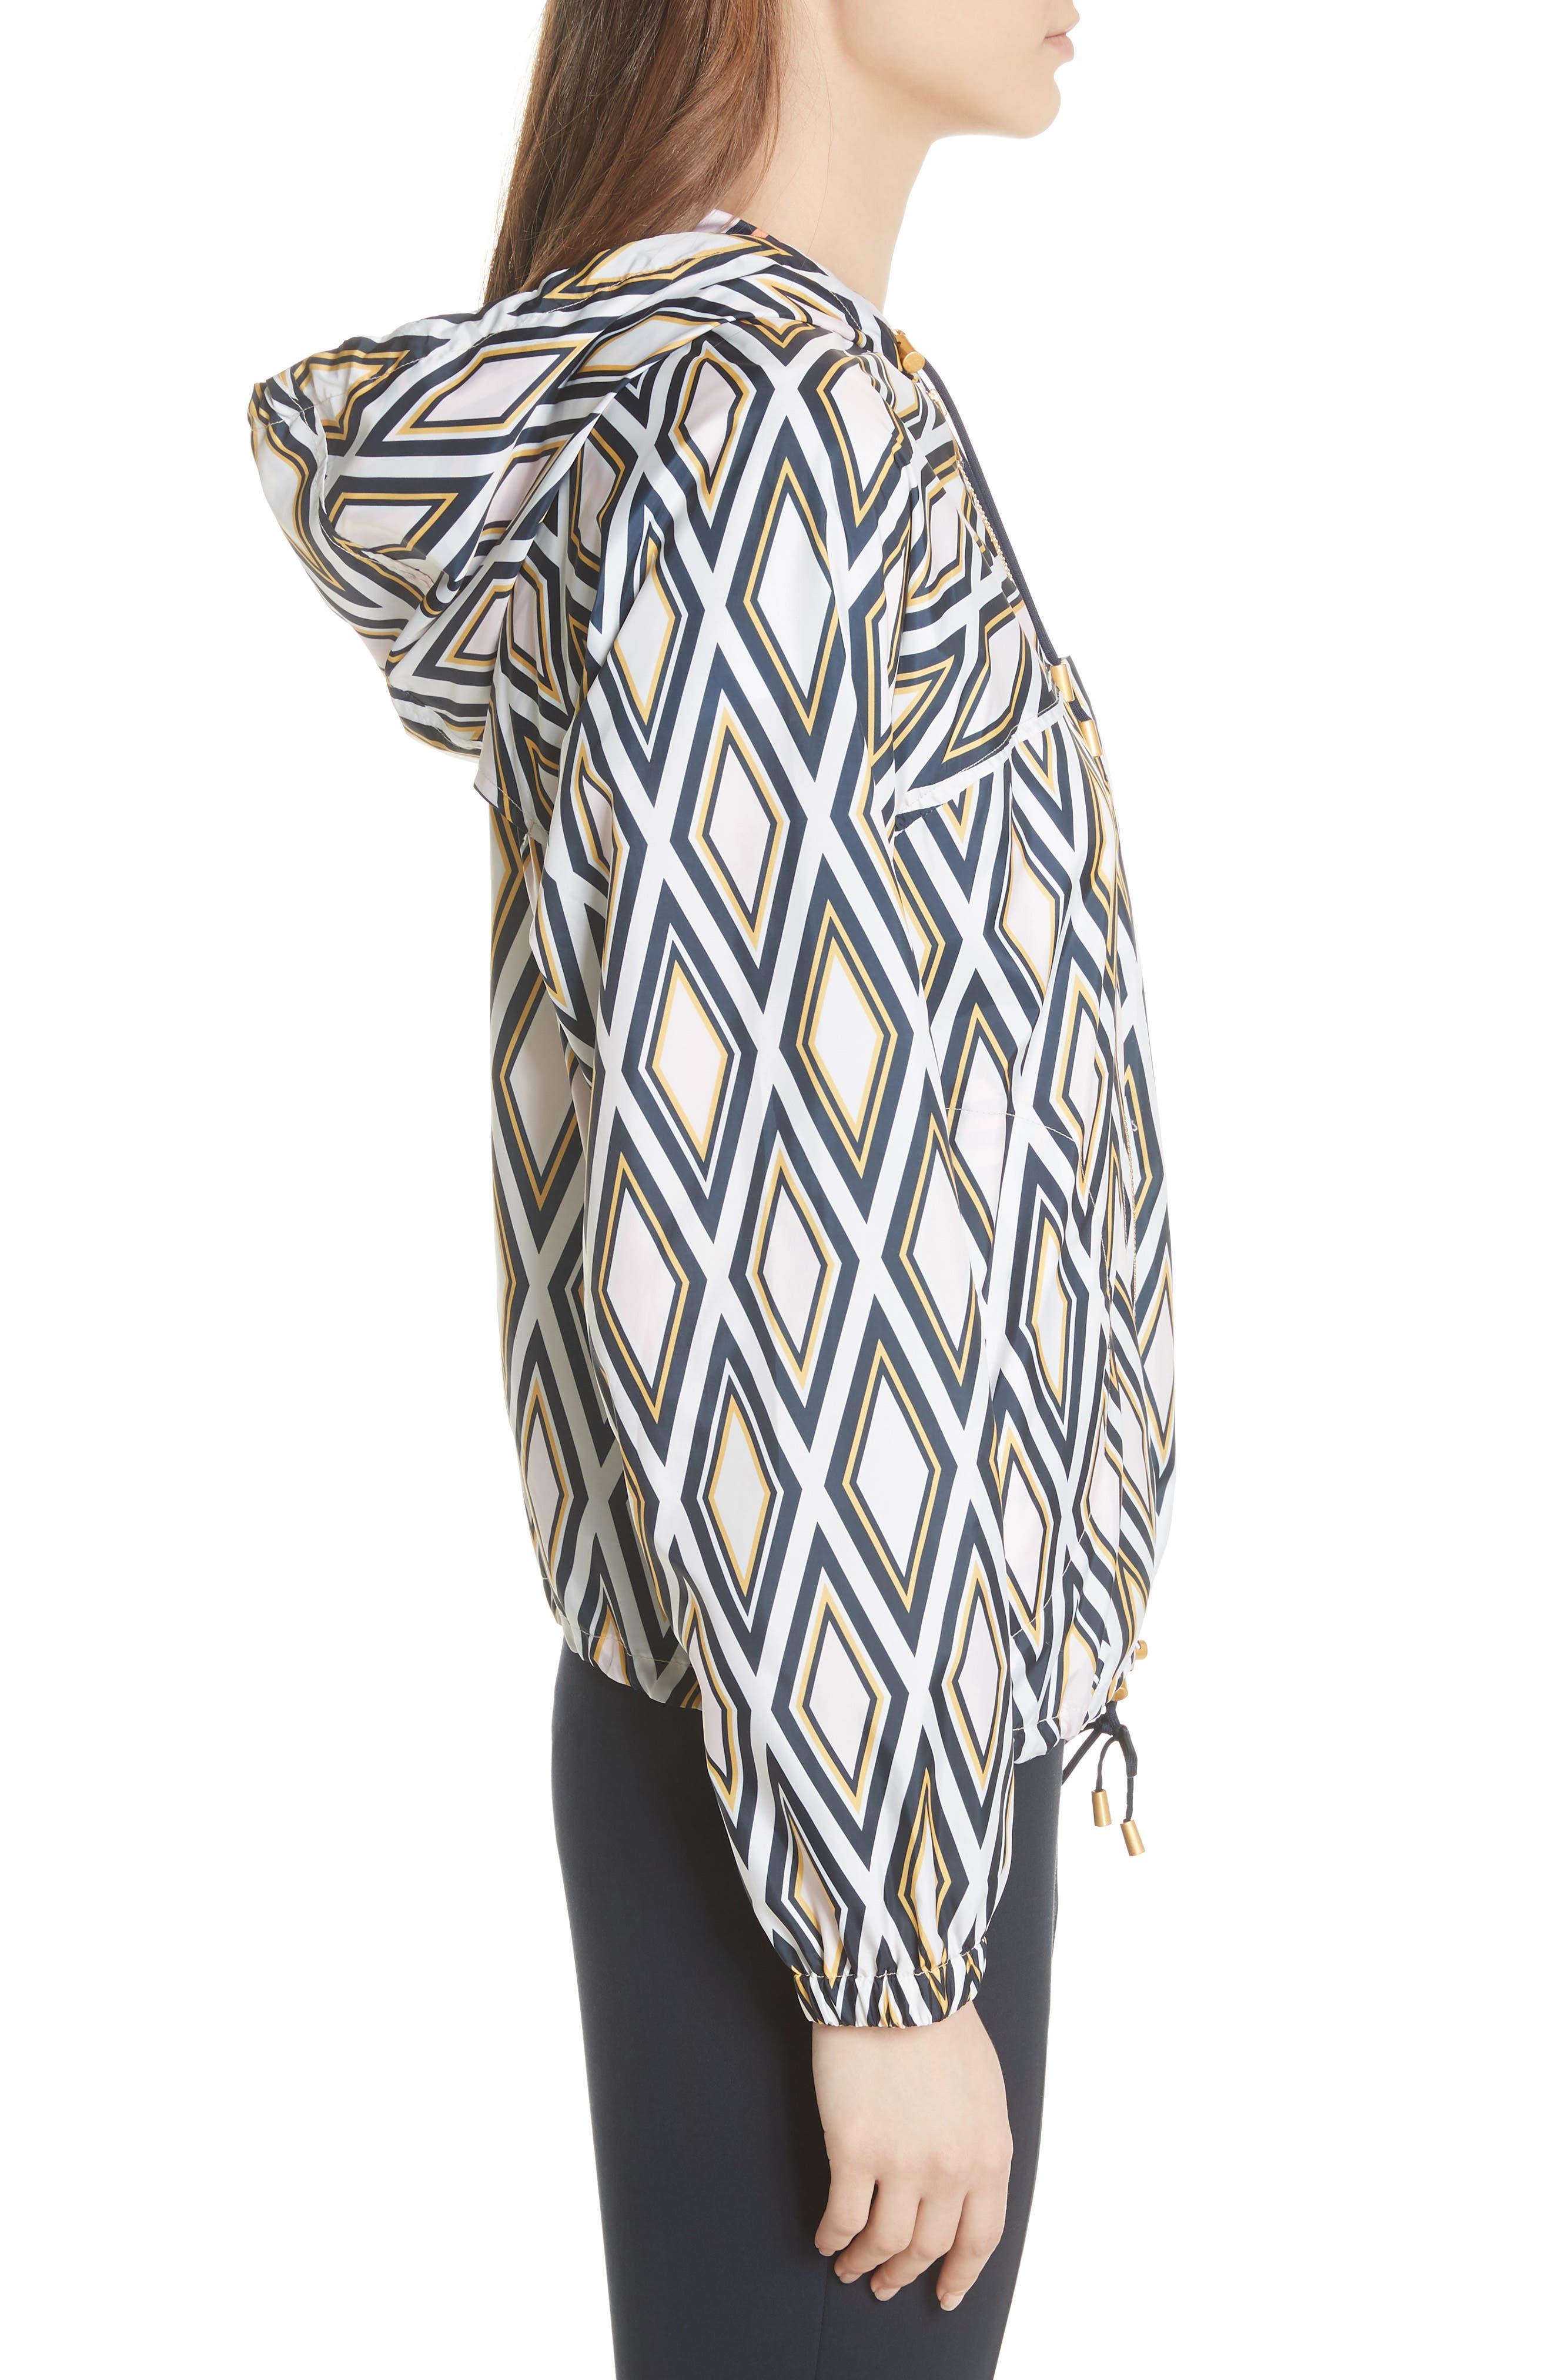 Devon Hooded Jacket,                             Alternate thumbnail 3, color,                             Solitaire Diamond